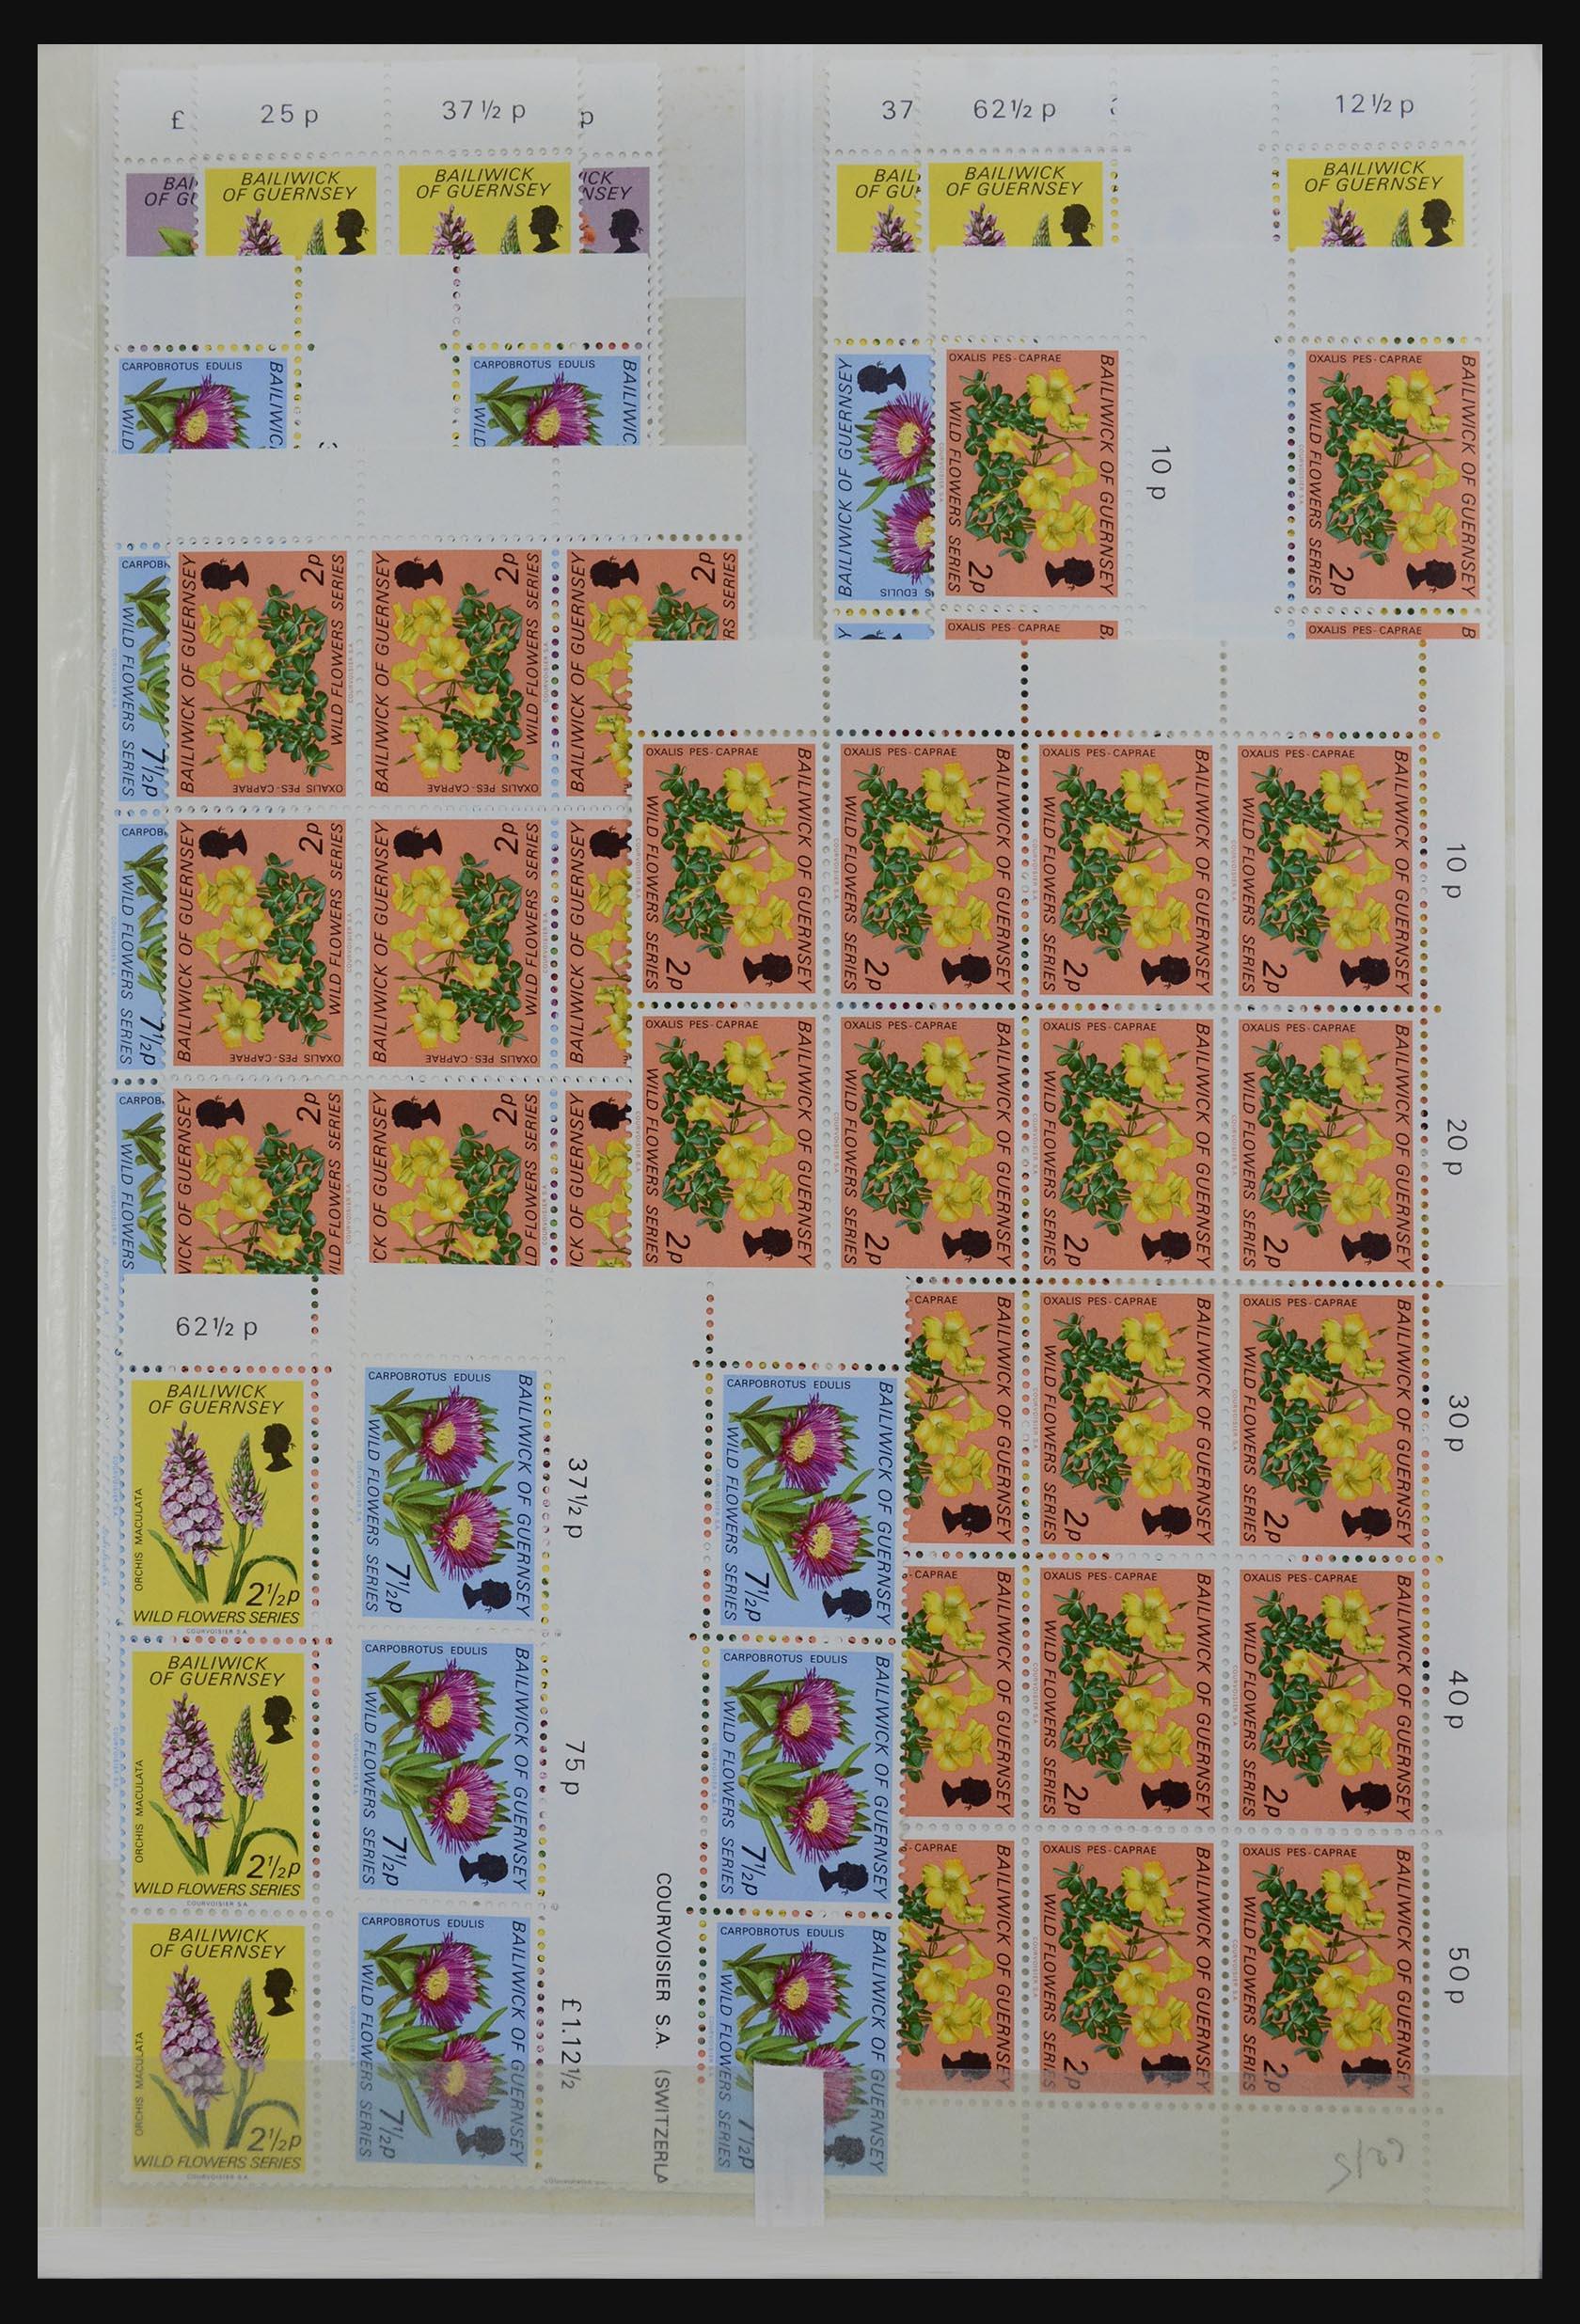 32180 001 - 32180 Guernsey 1972-1992.